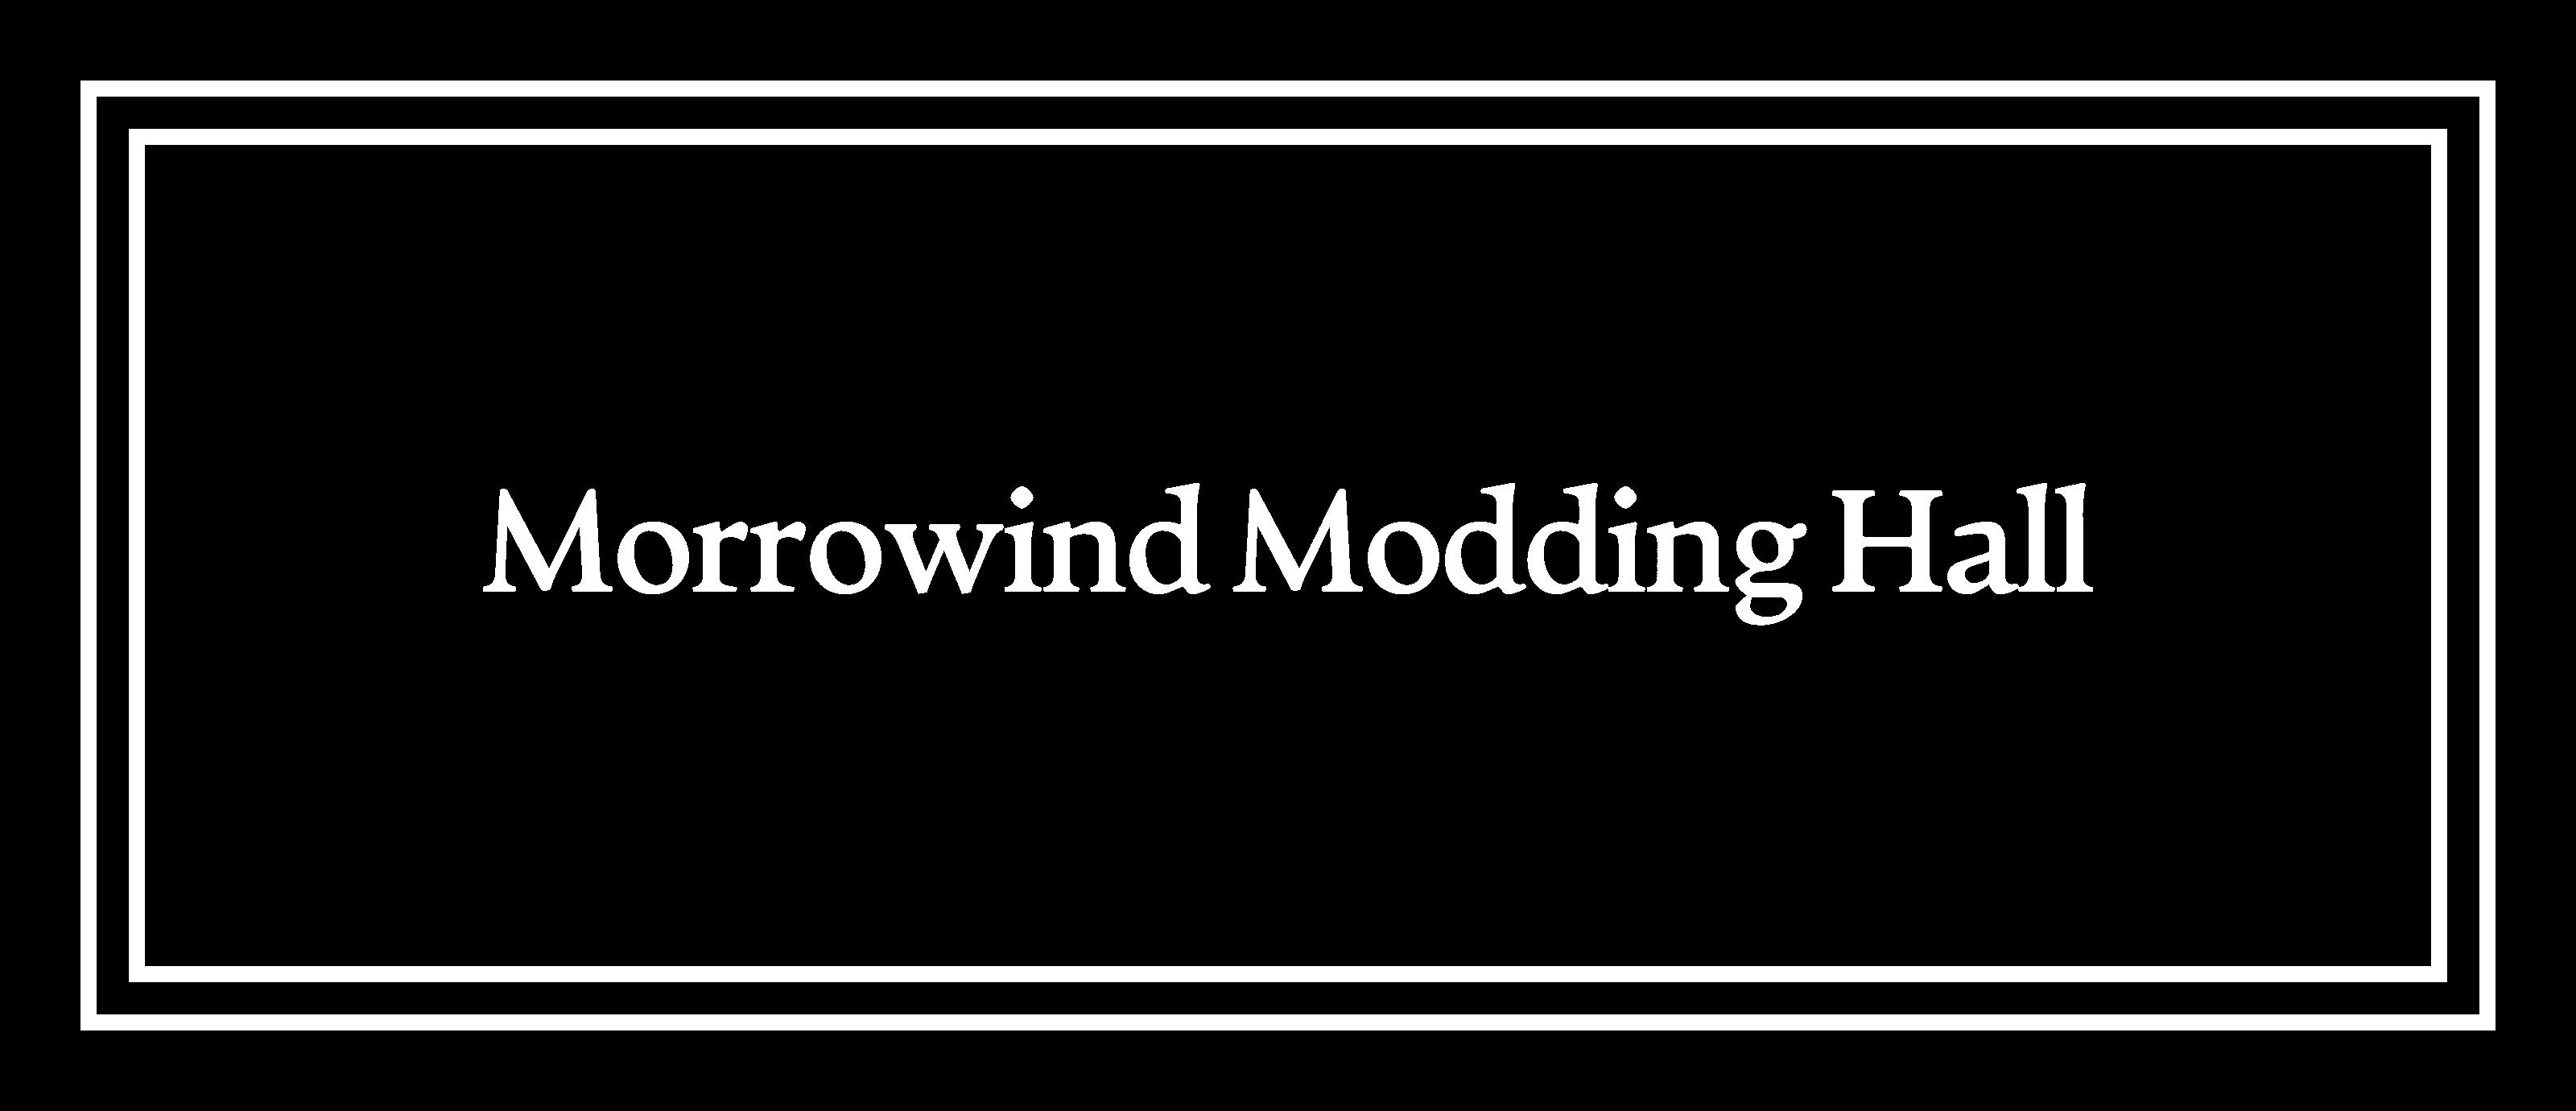 Morrowind Modding Hall